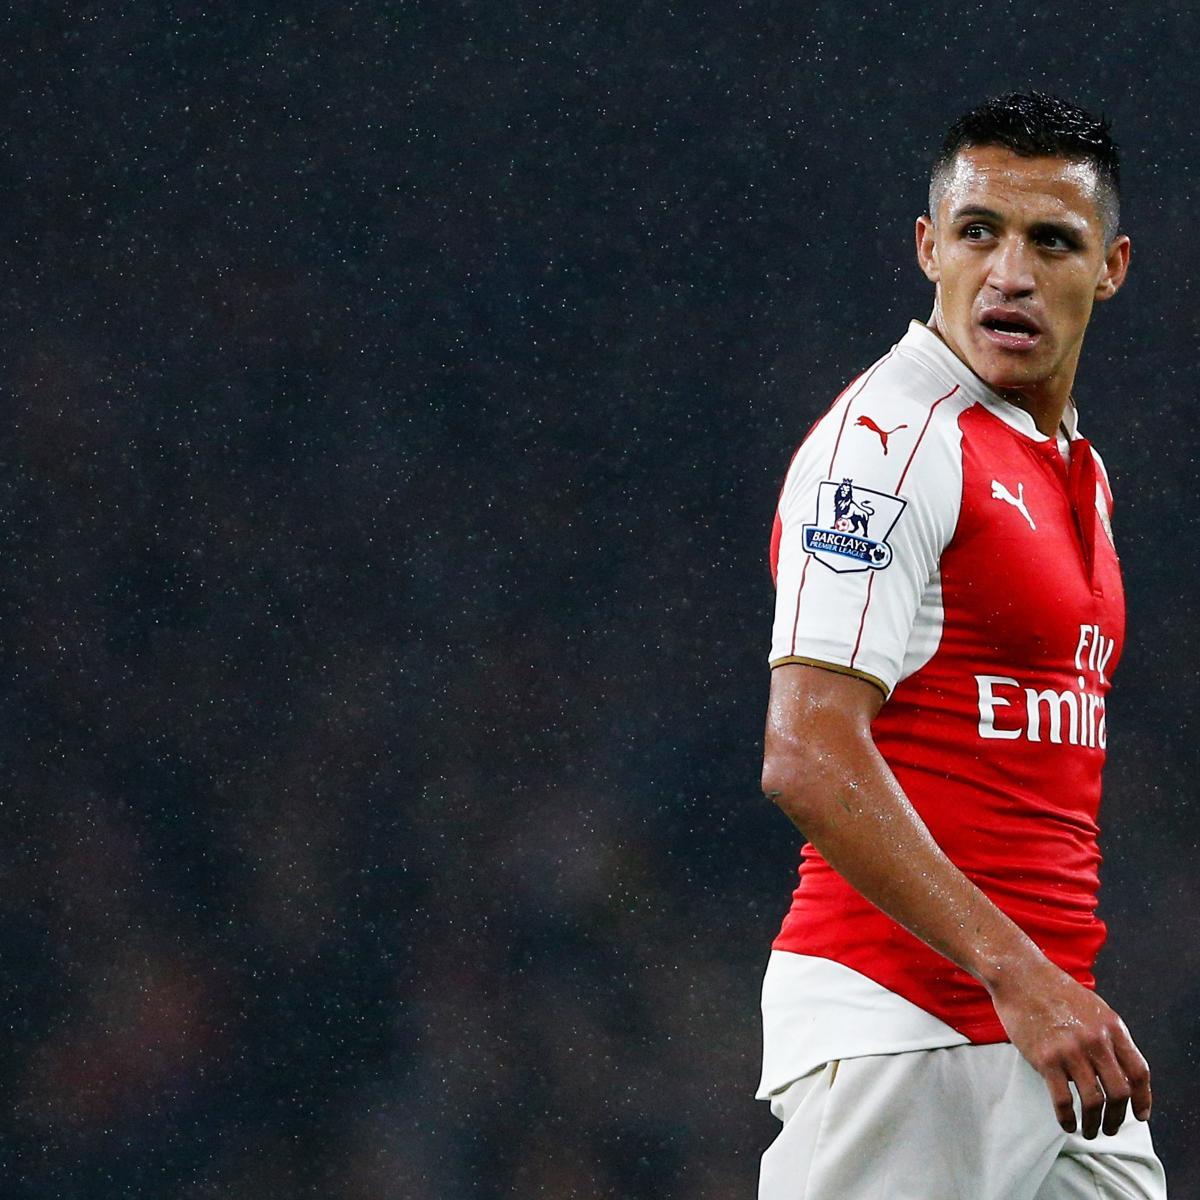 Manchester United Transfer News Alexis Sanchez Rumours: Arsenal Transfer News: Alexis Sanchez Exit Rumours Persist